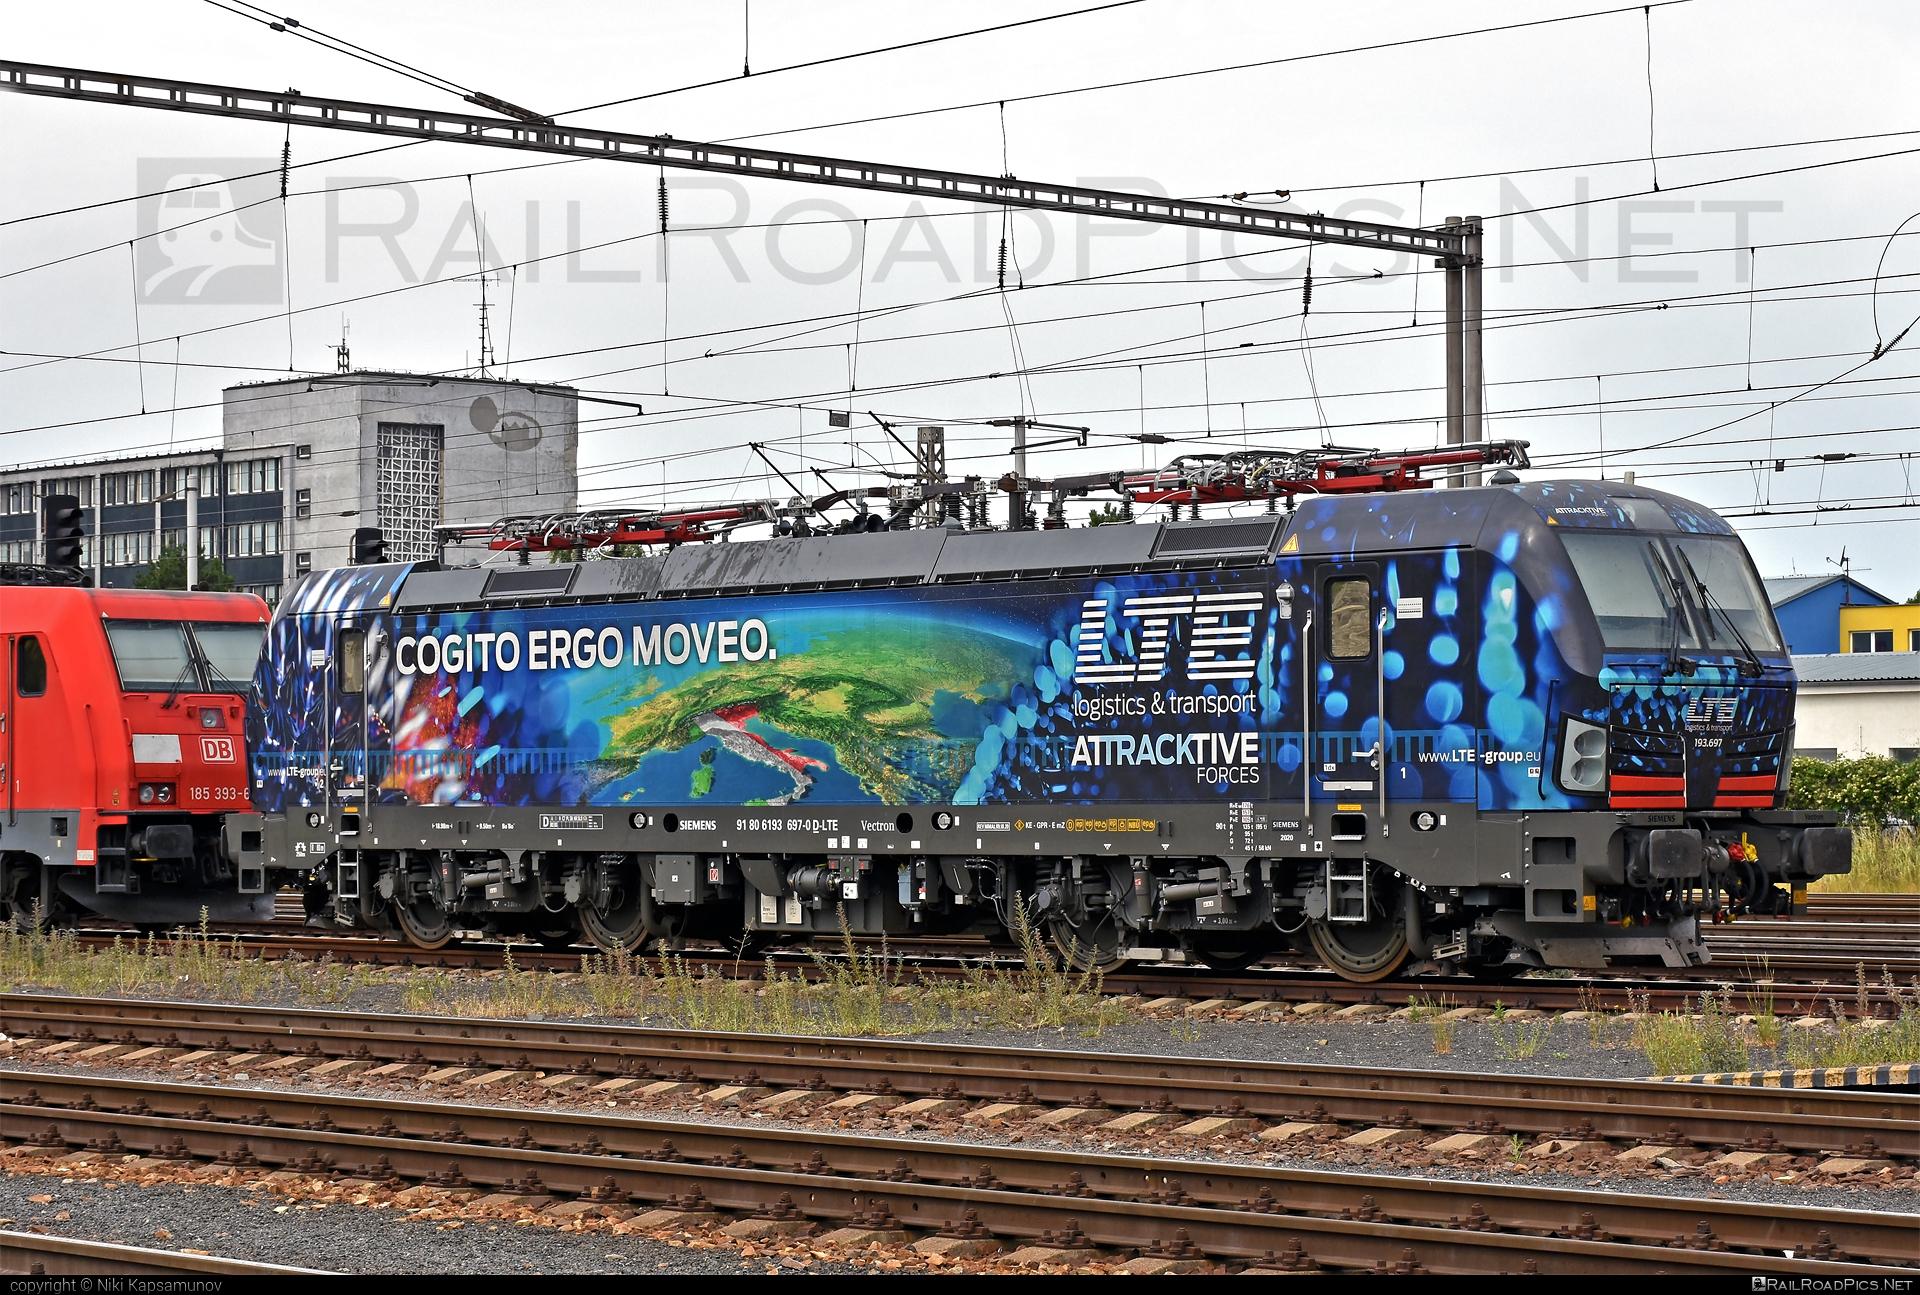 Siemens Vectron MS - 193 697 operated by LTE Logistik und Transport GmbH #lte #ltelogistikundtransport #ltelogistikundtransportgmbh #siemens #siemensvectron #siemensvectronms #vectron #vectronms